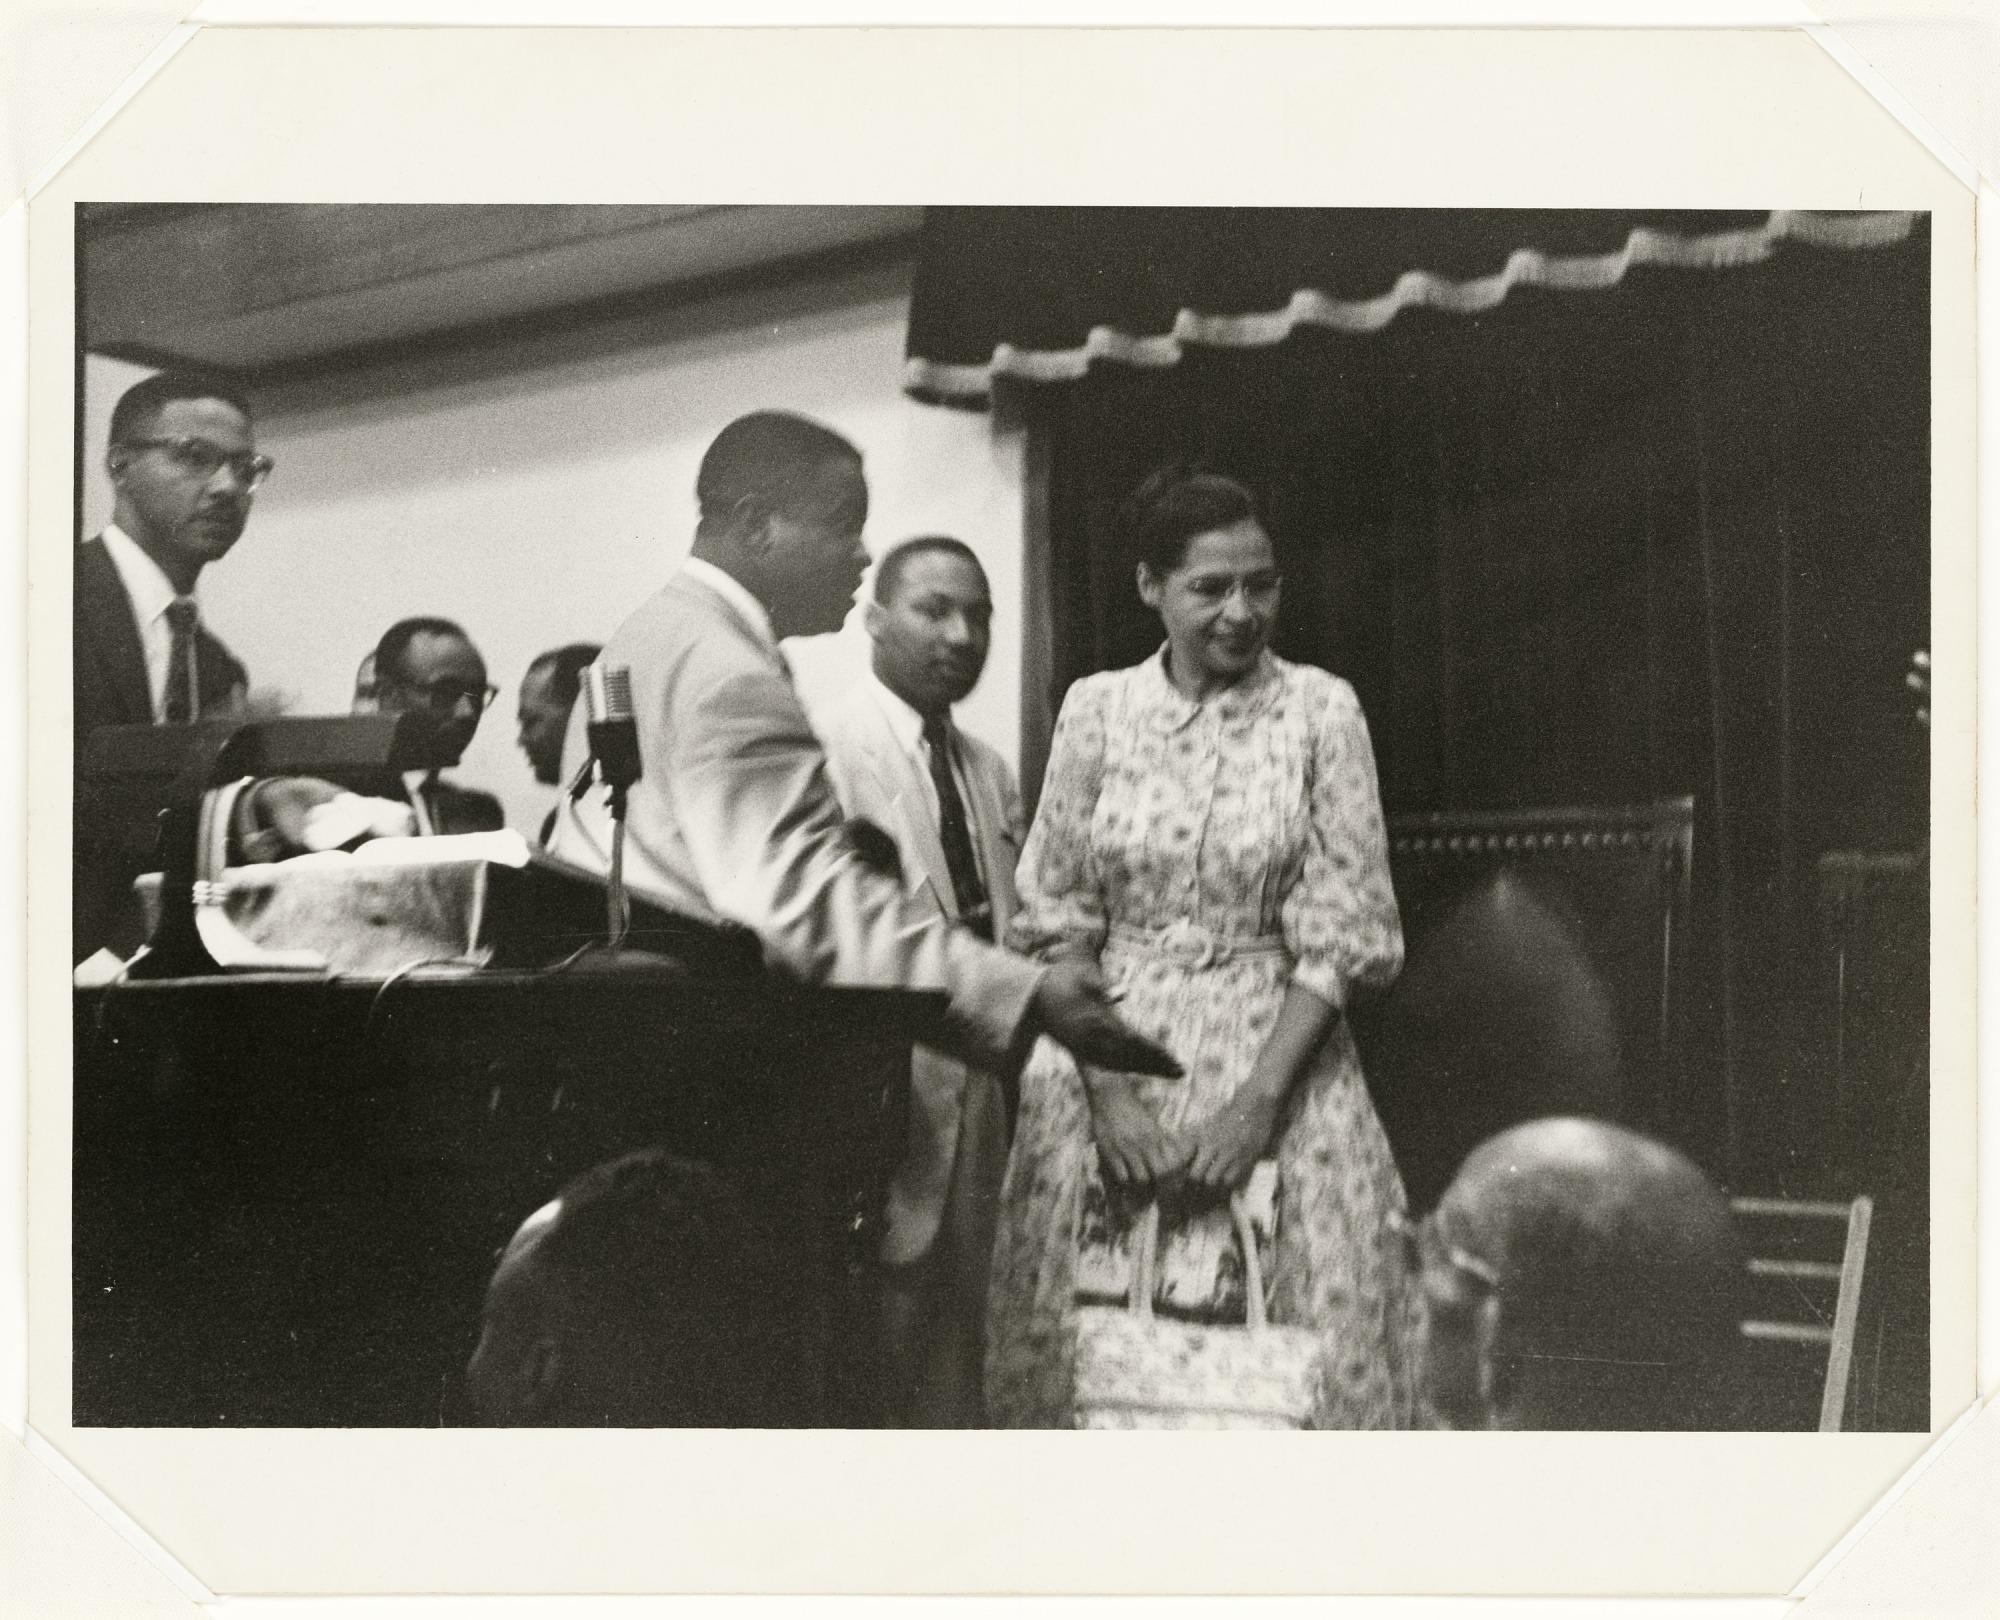 images for <I>Rosa Parks, Martin Luther King Jr., and Ralph Abernathy, Ebenezer Baptist Church During Bus Boycott</I>